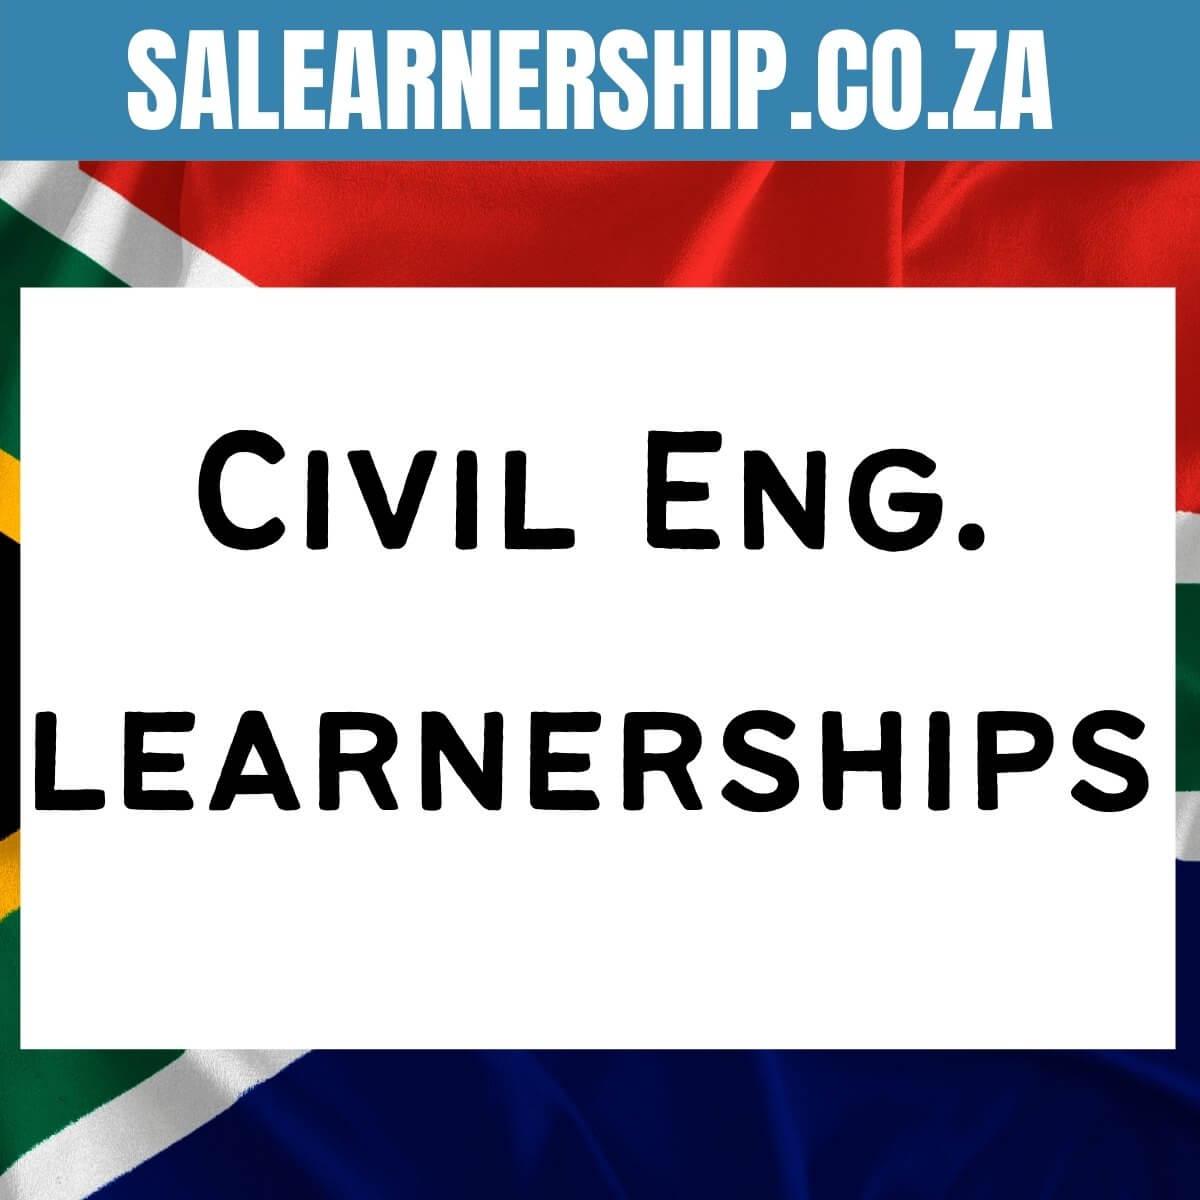 civil engineering learnerships